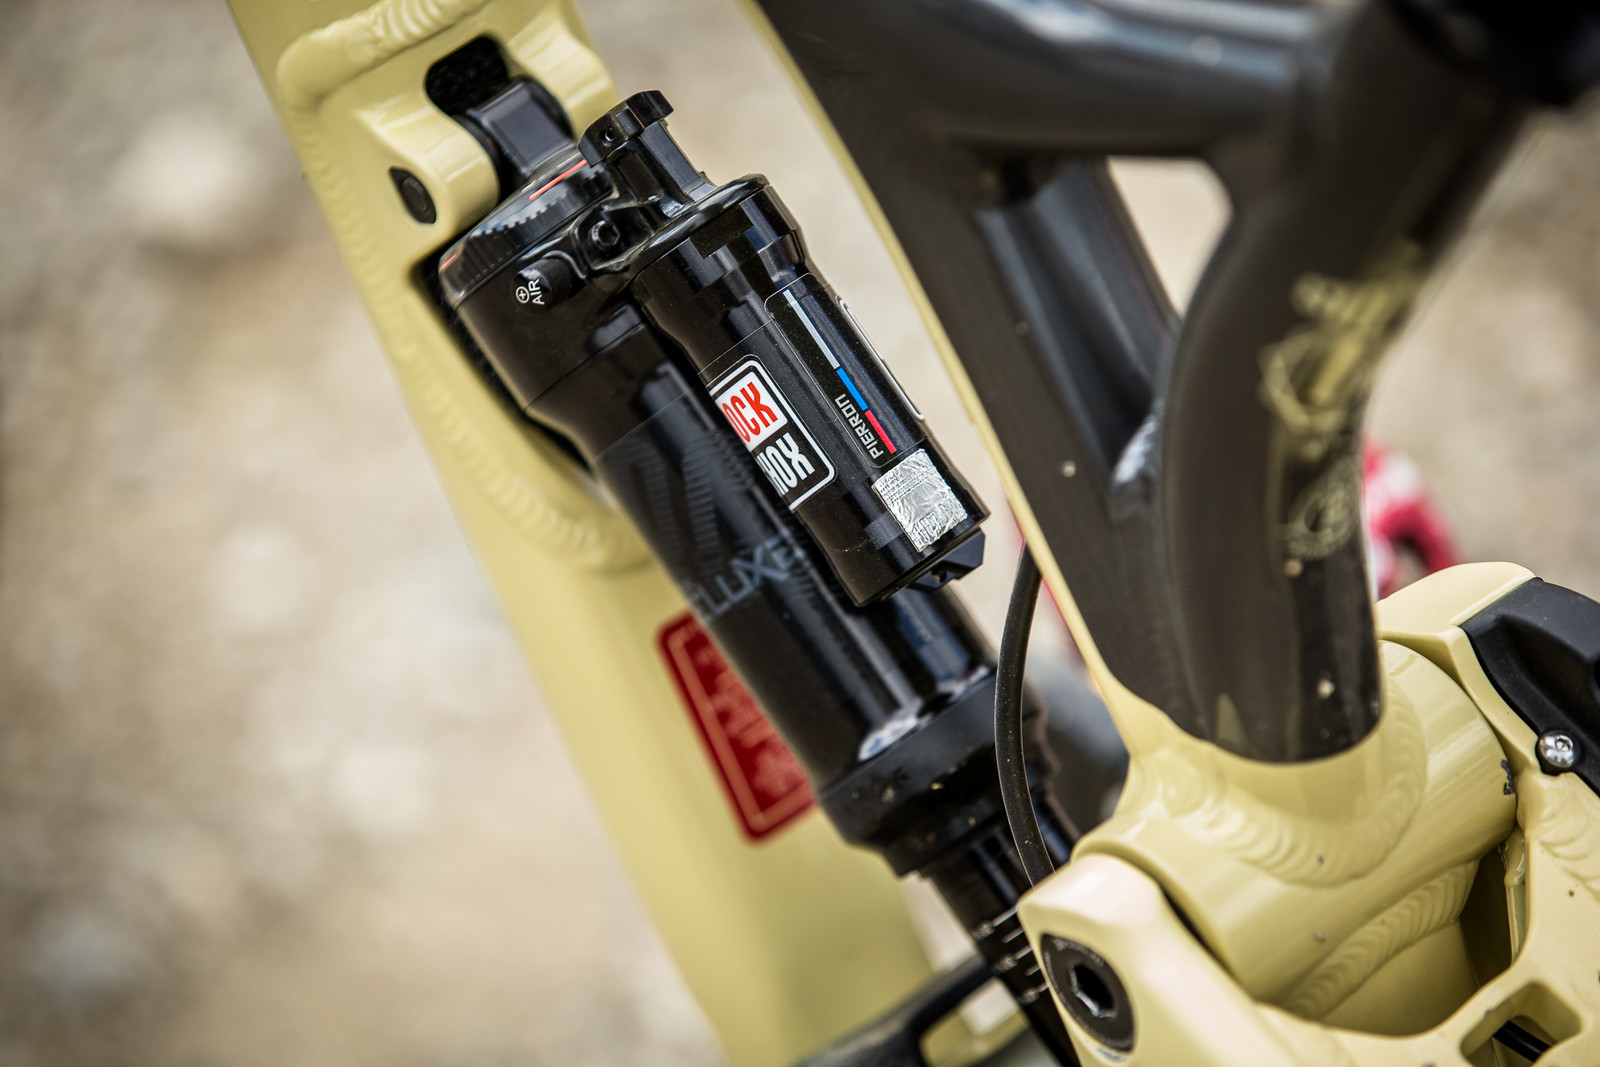 RockShox SuperDeluxe Air Shock - WINNING BIKE - Amaury Pierron's Commencal Supreme DH 29 - Mountain Biking Pictures - Vital MTB